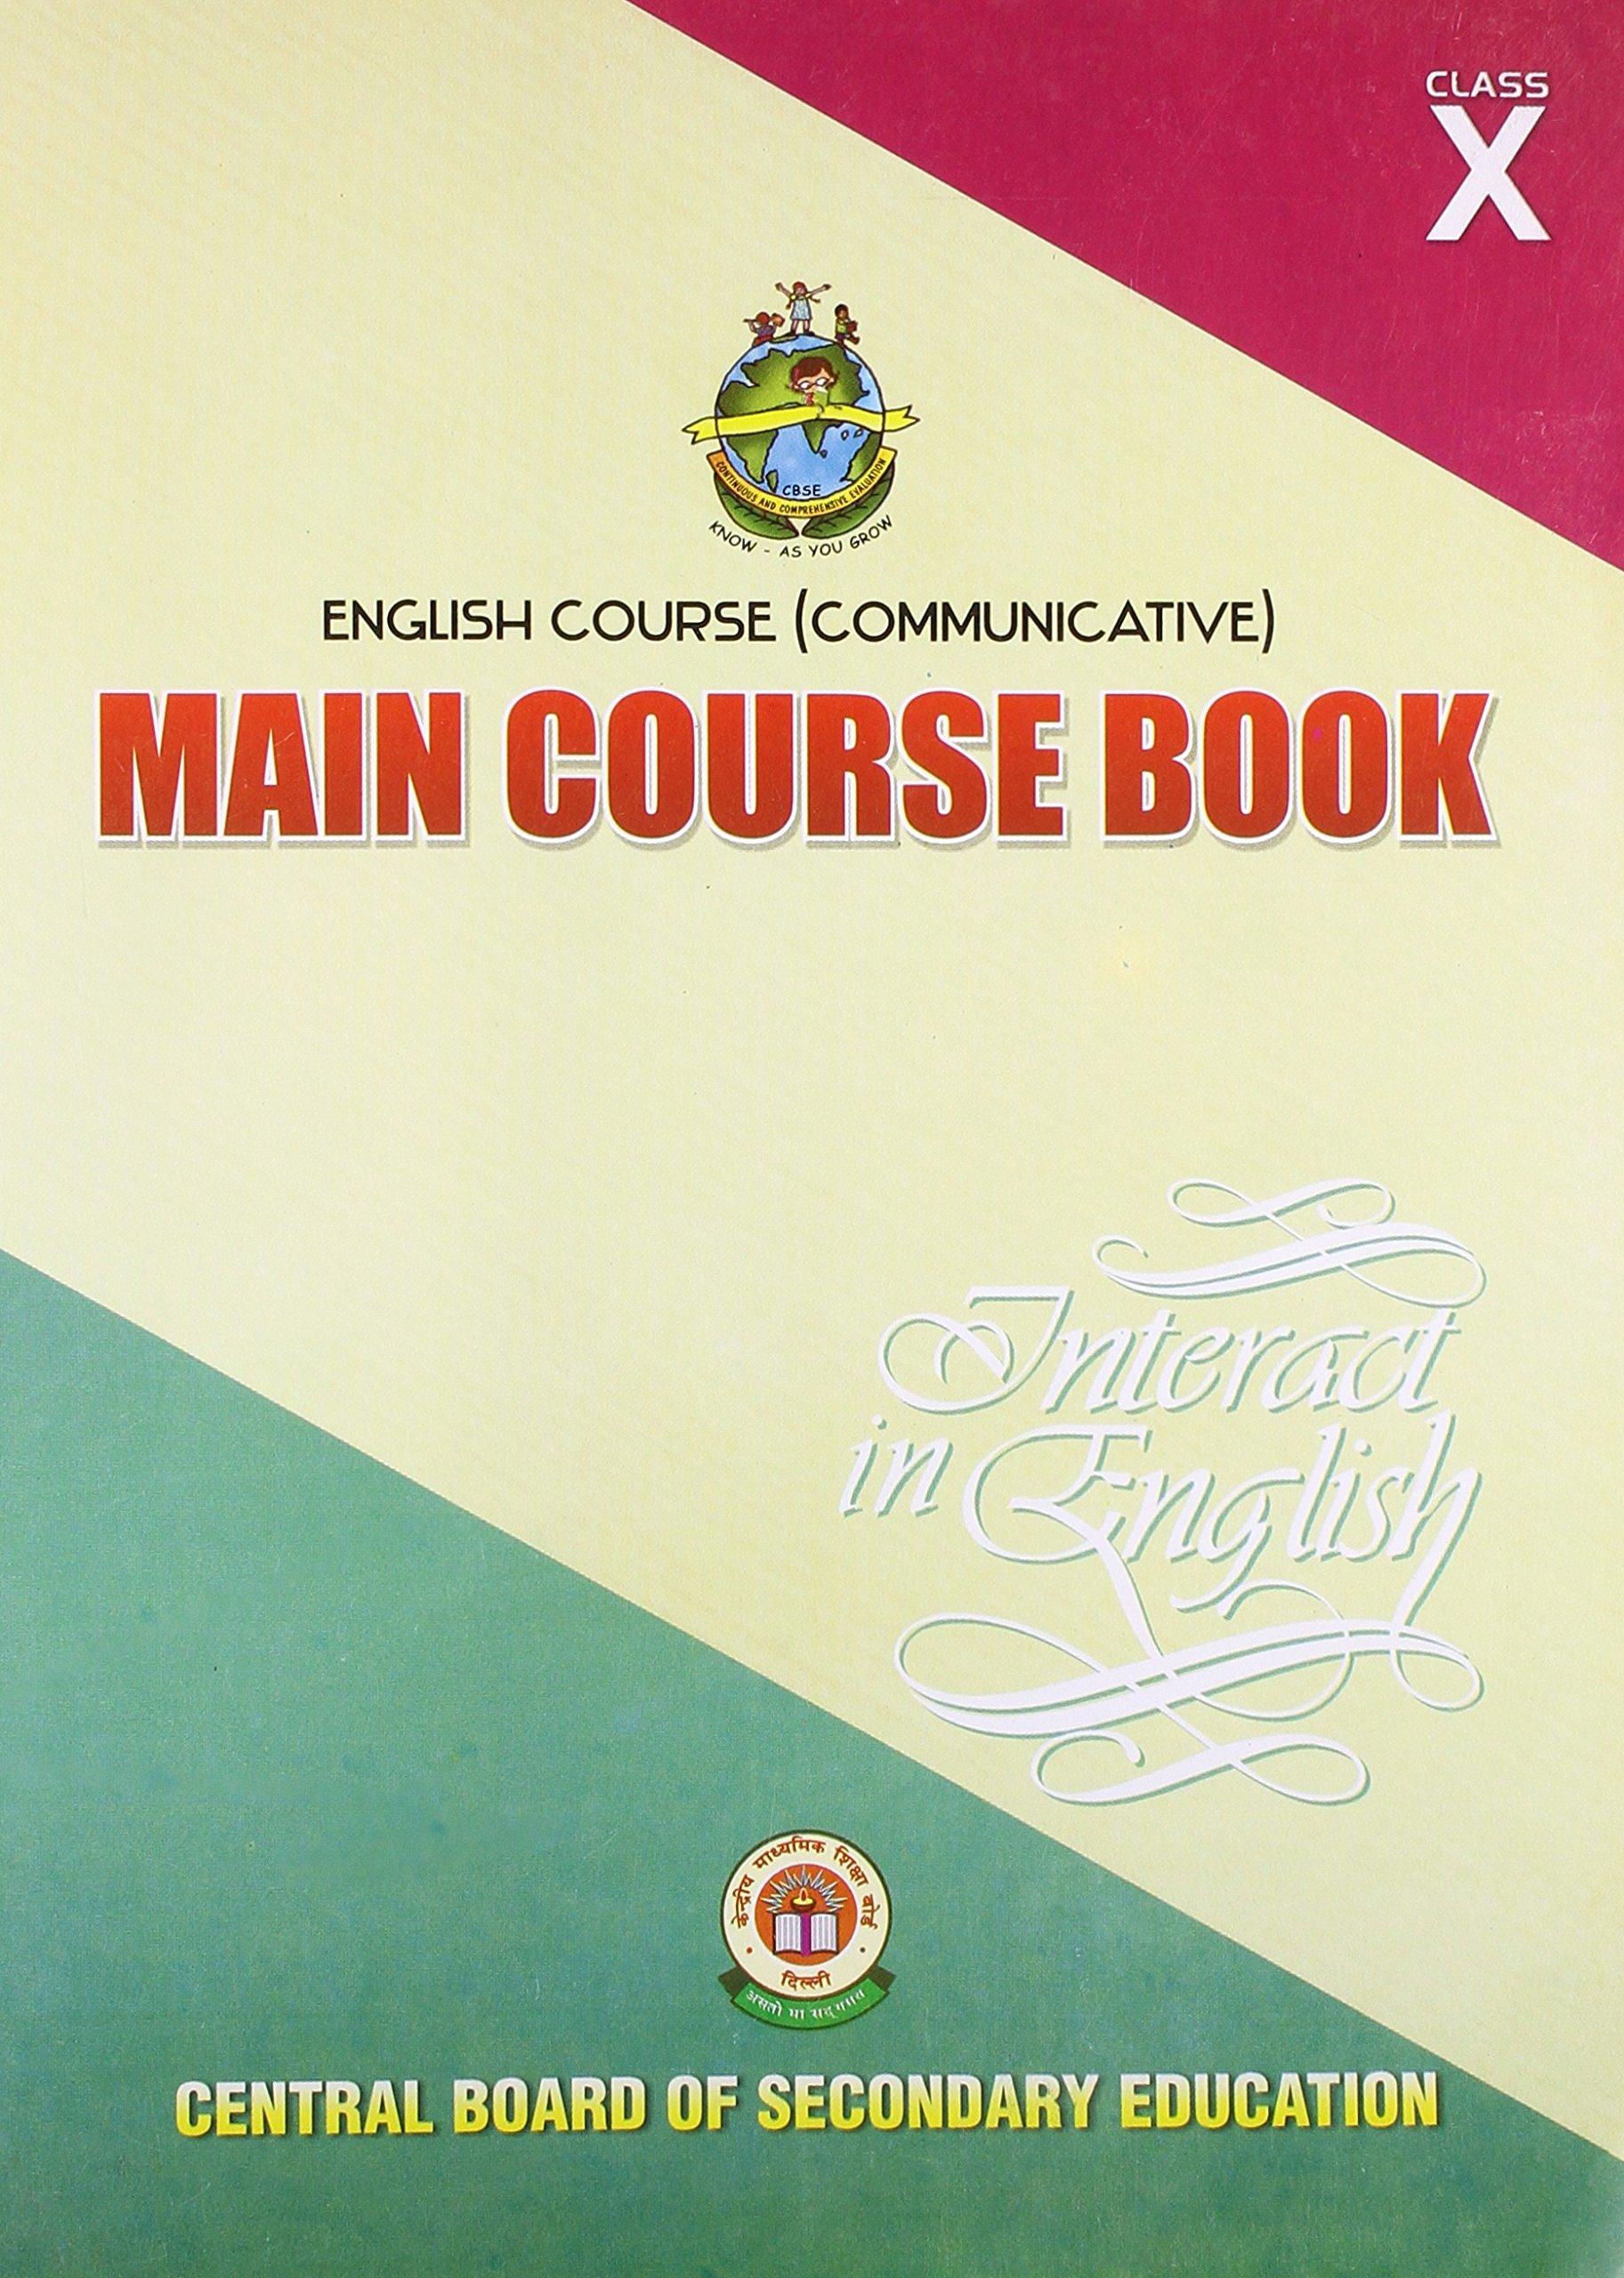 English Course Communicative: Main Course Book Interact in English - Class  10: Amazon.in: CBSE: Books